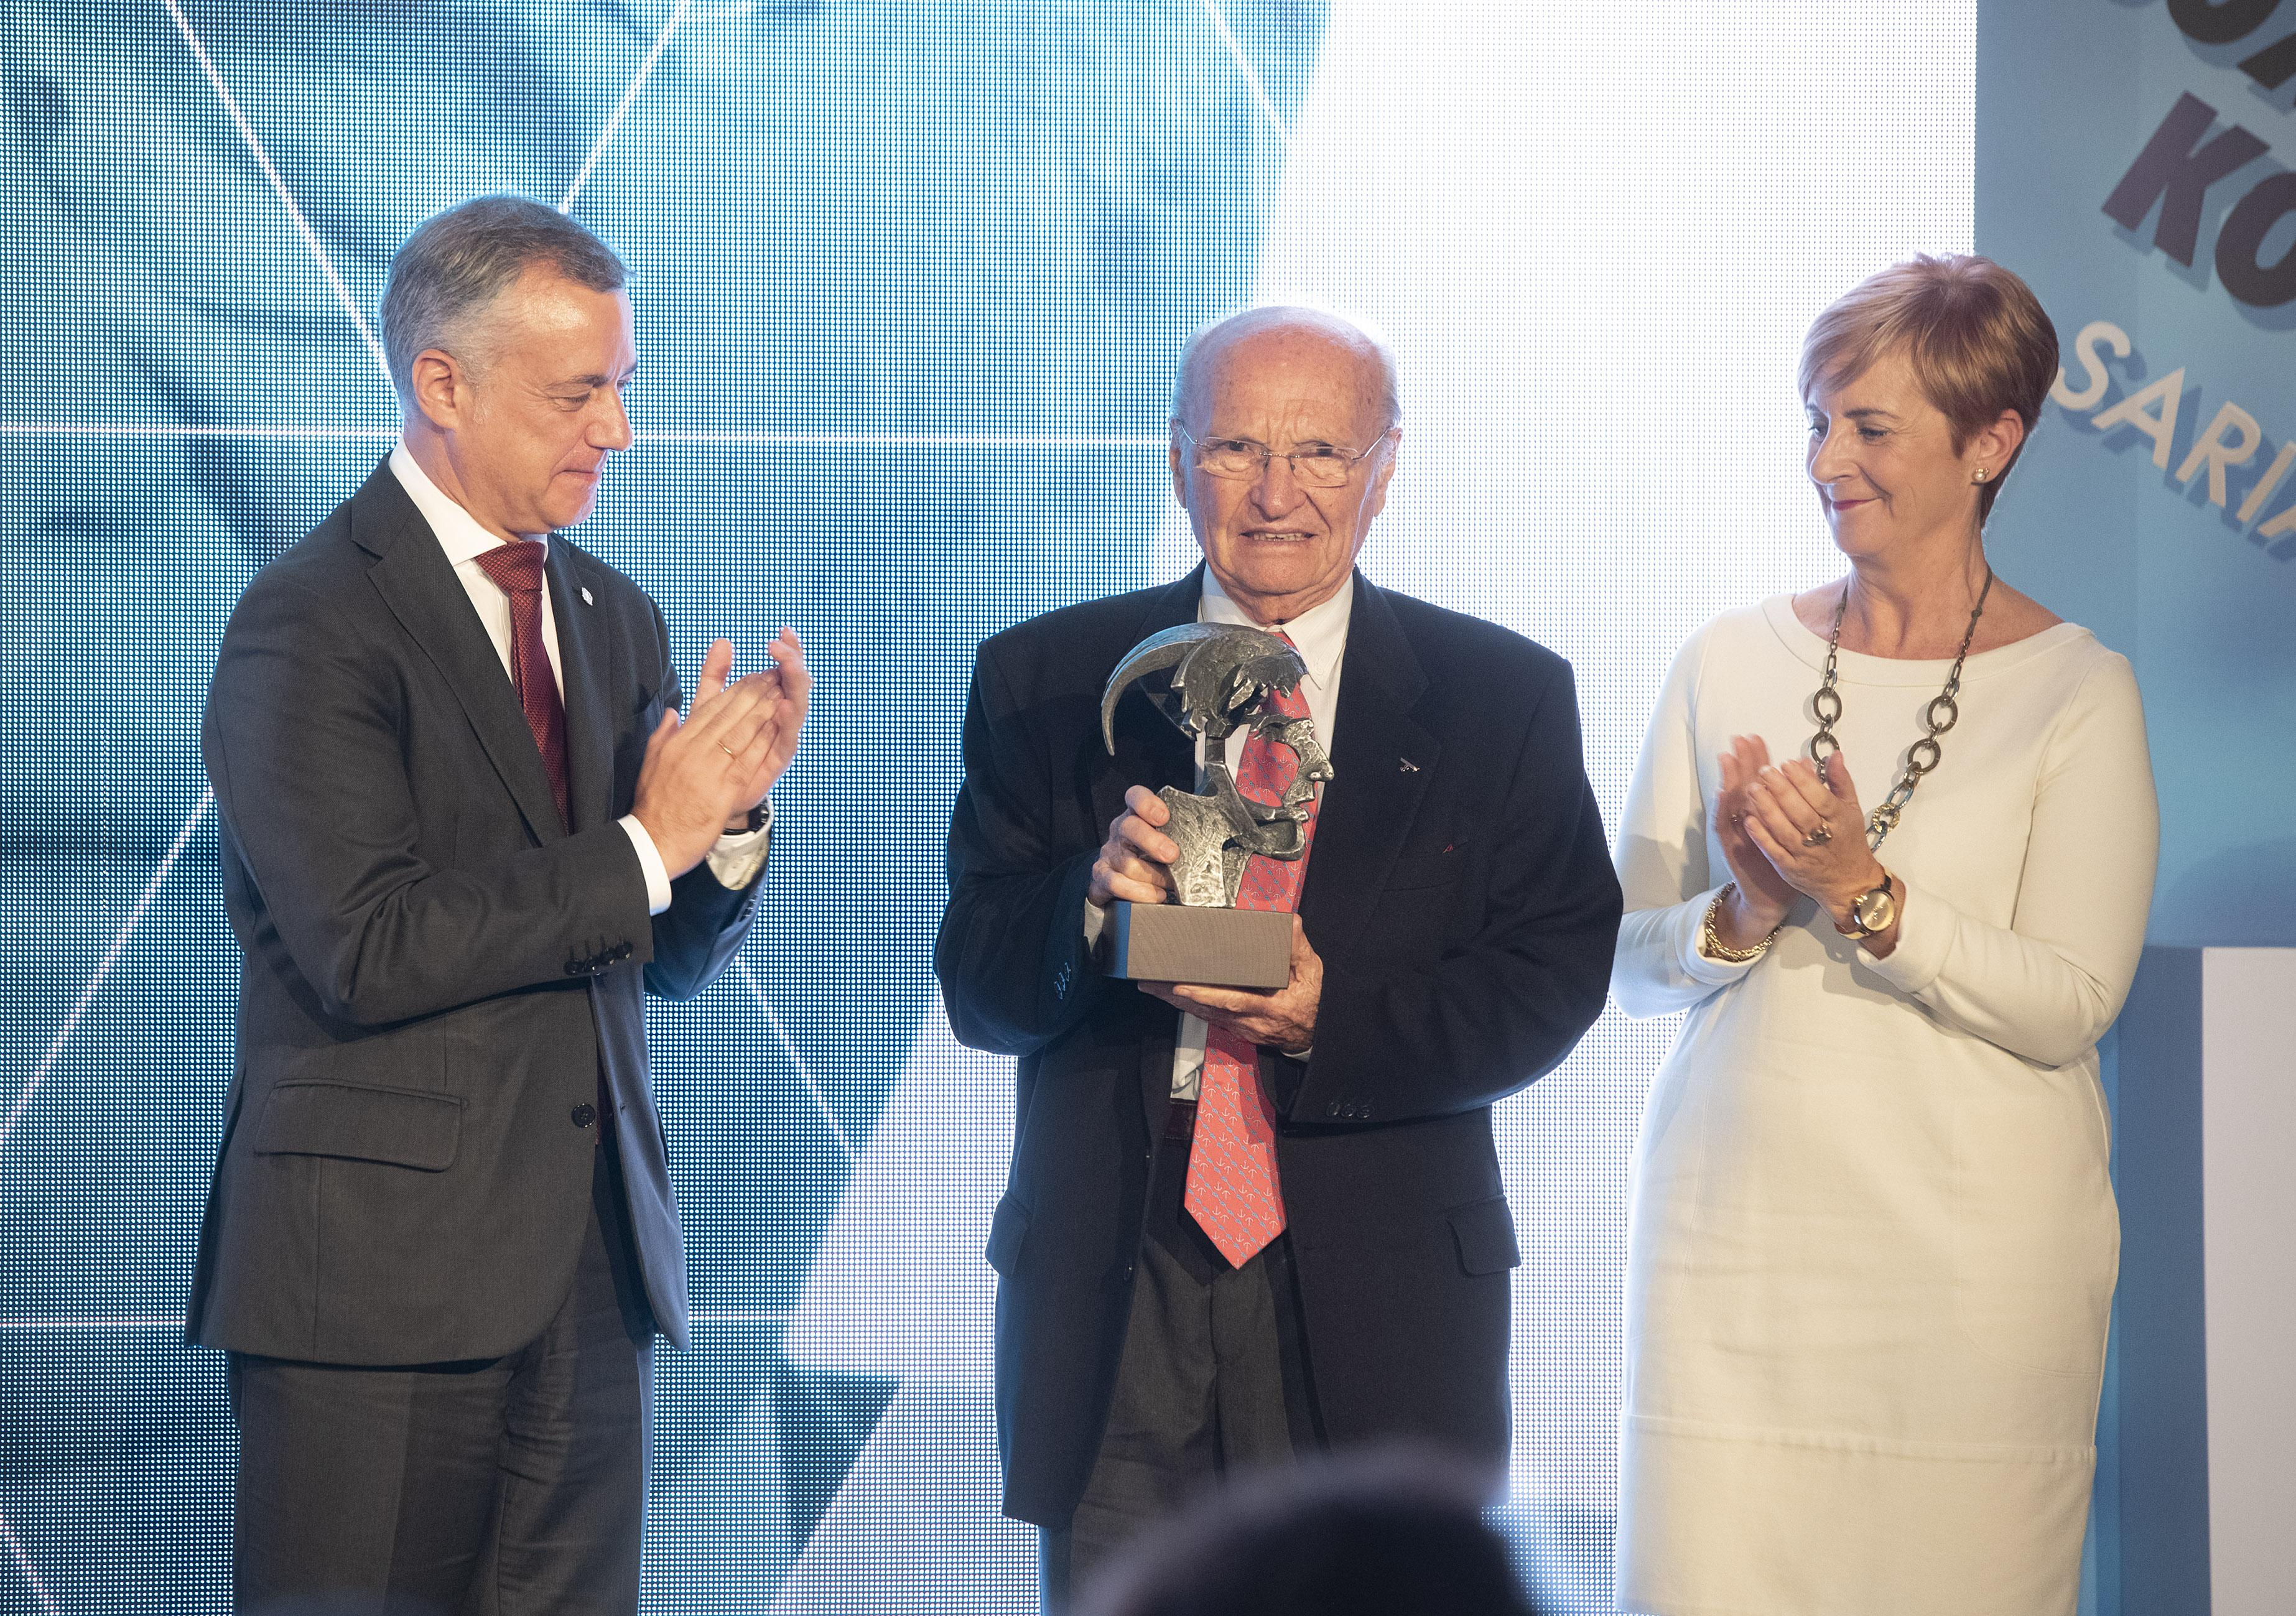 Javier Maria Onaindia Gravé (Onaindia). Premios Joxe Mari Korta Sariak 2018